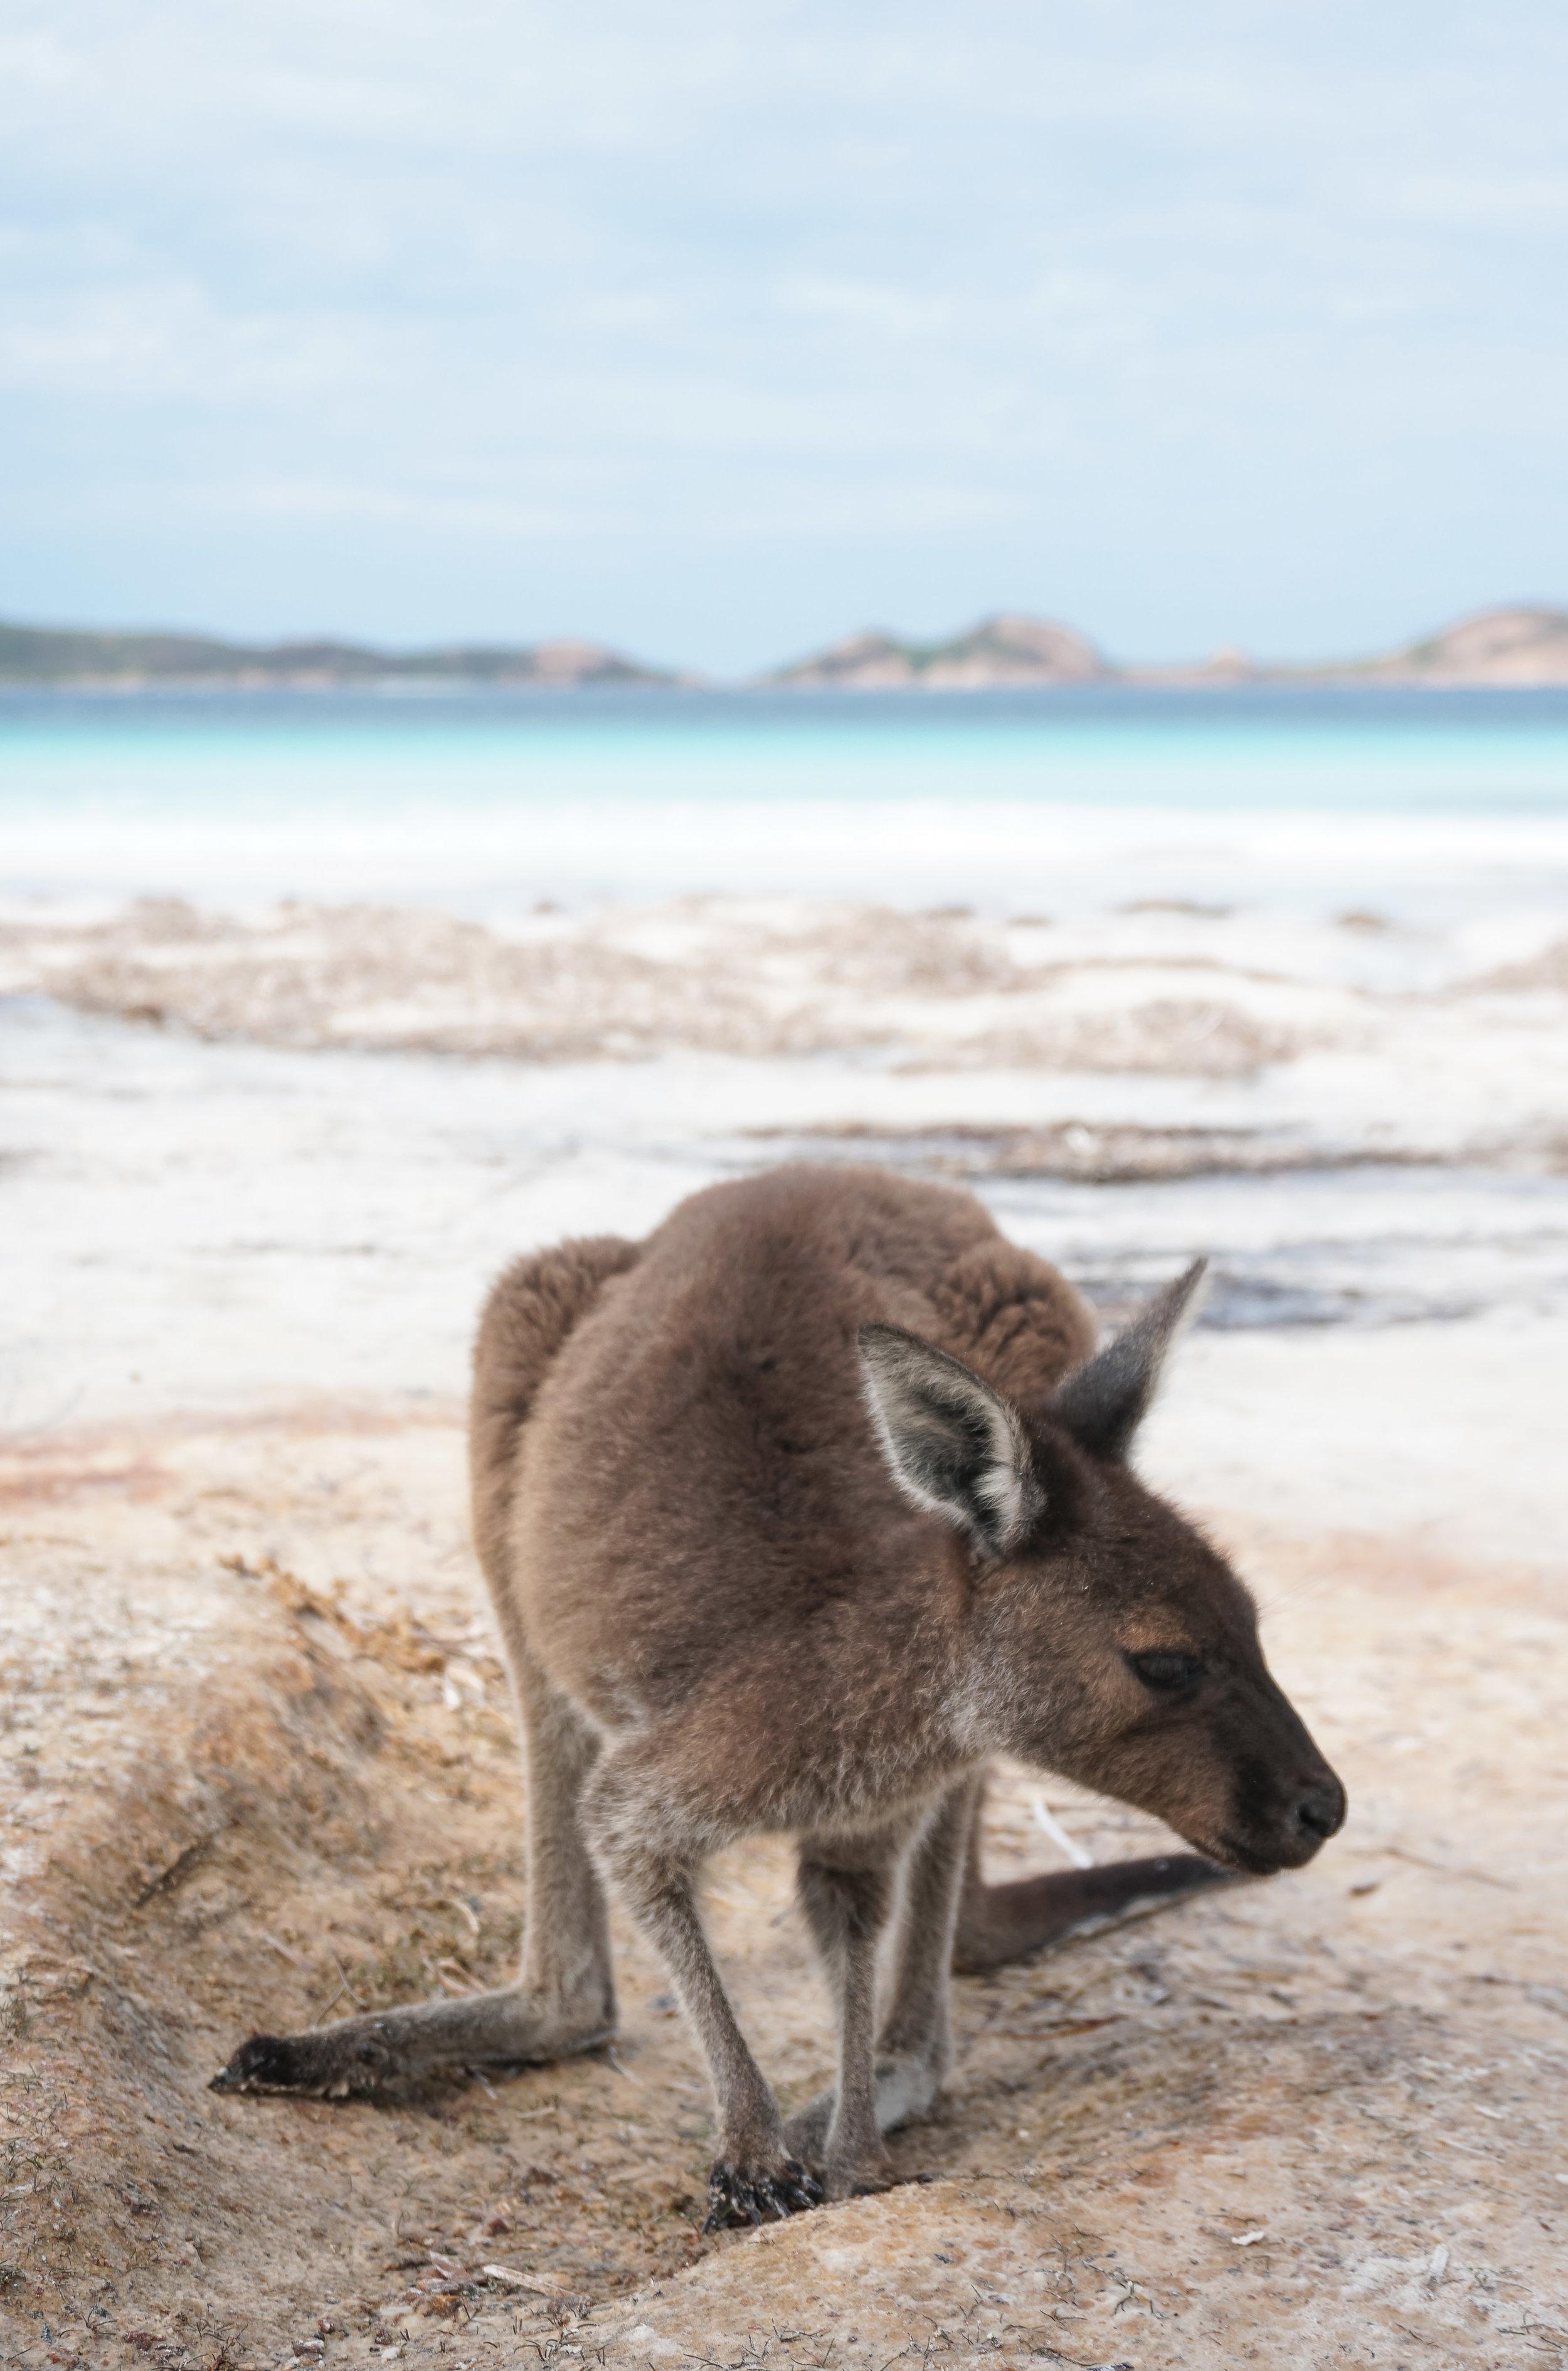 AUSTRALIA, AUSTRALASIA